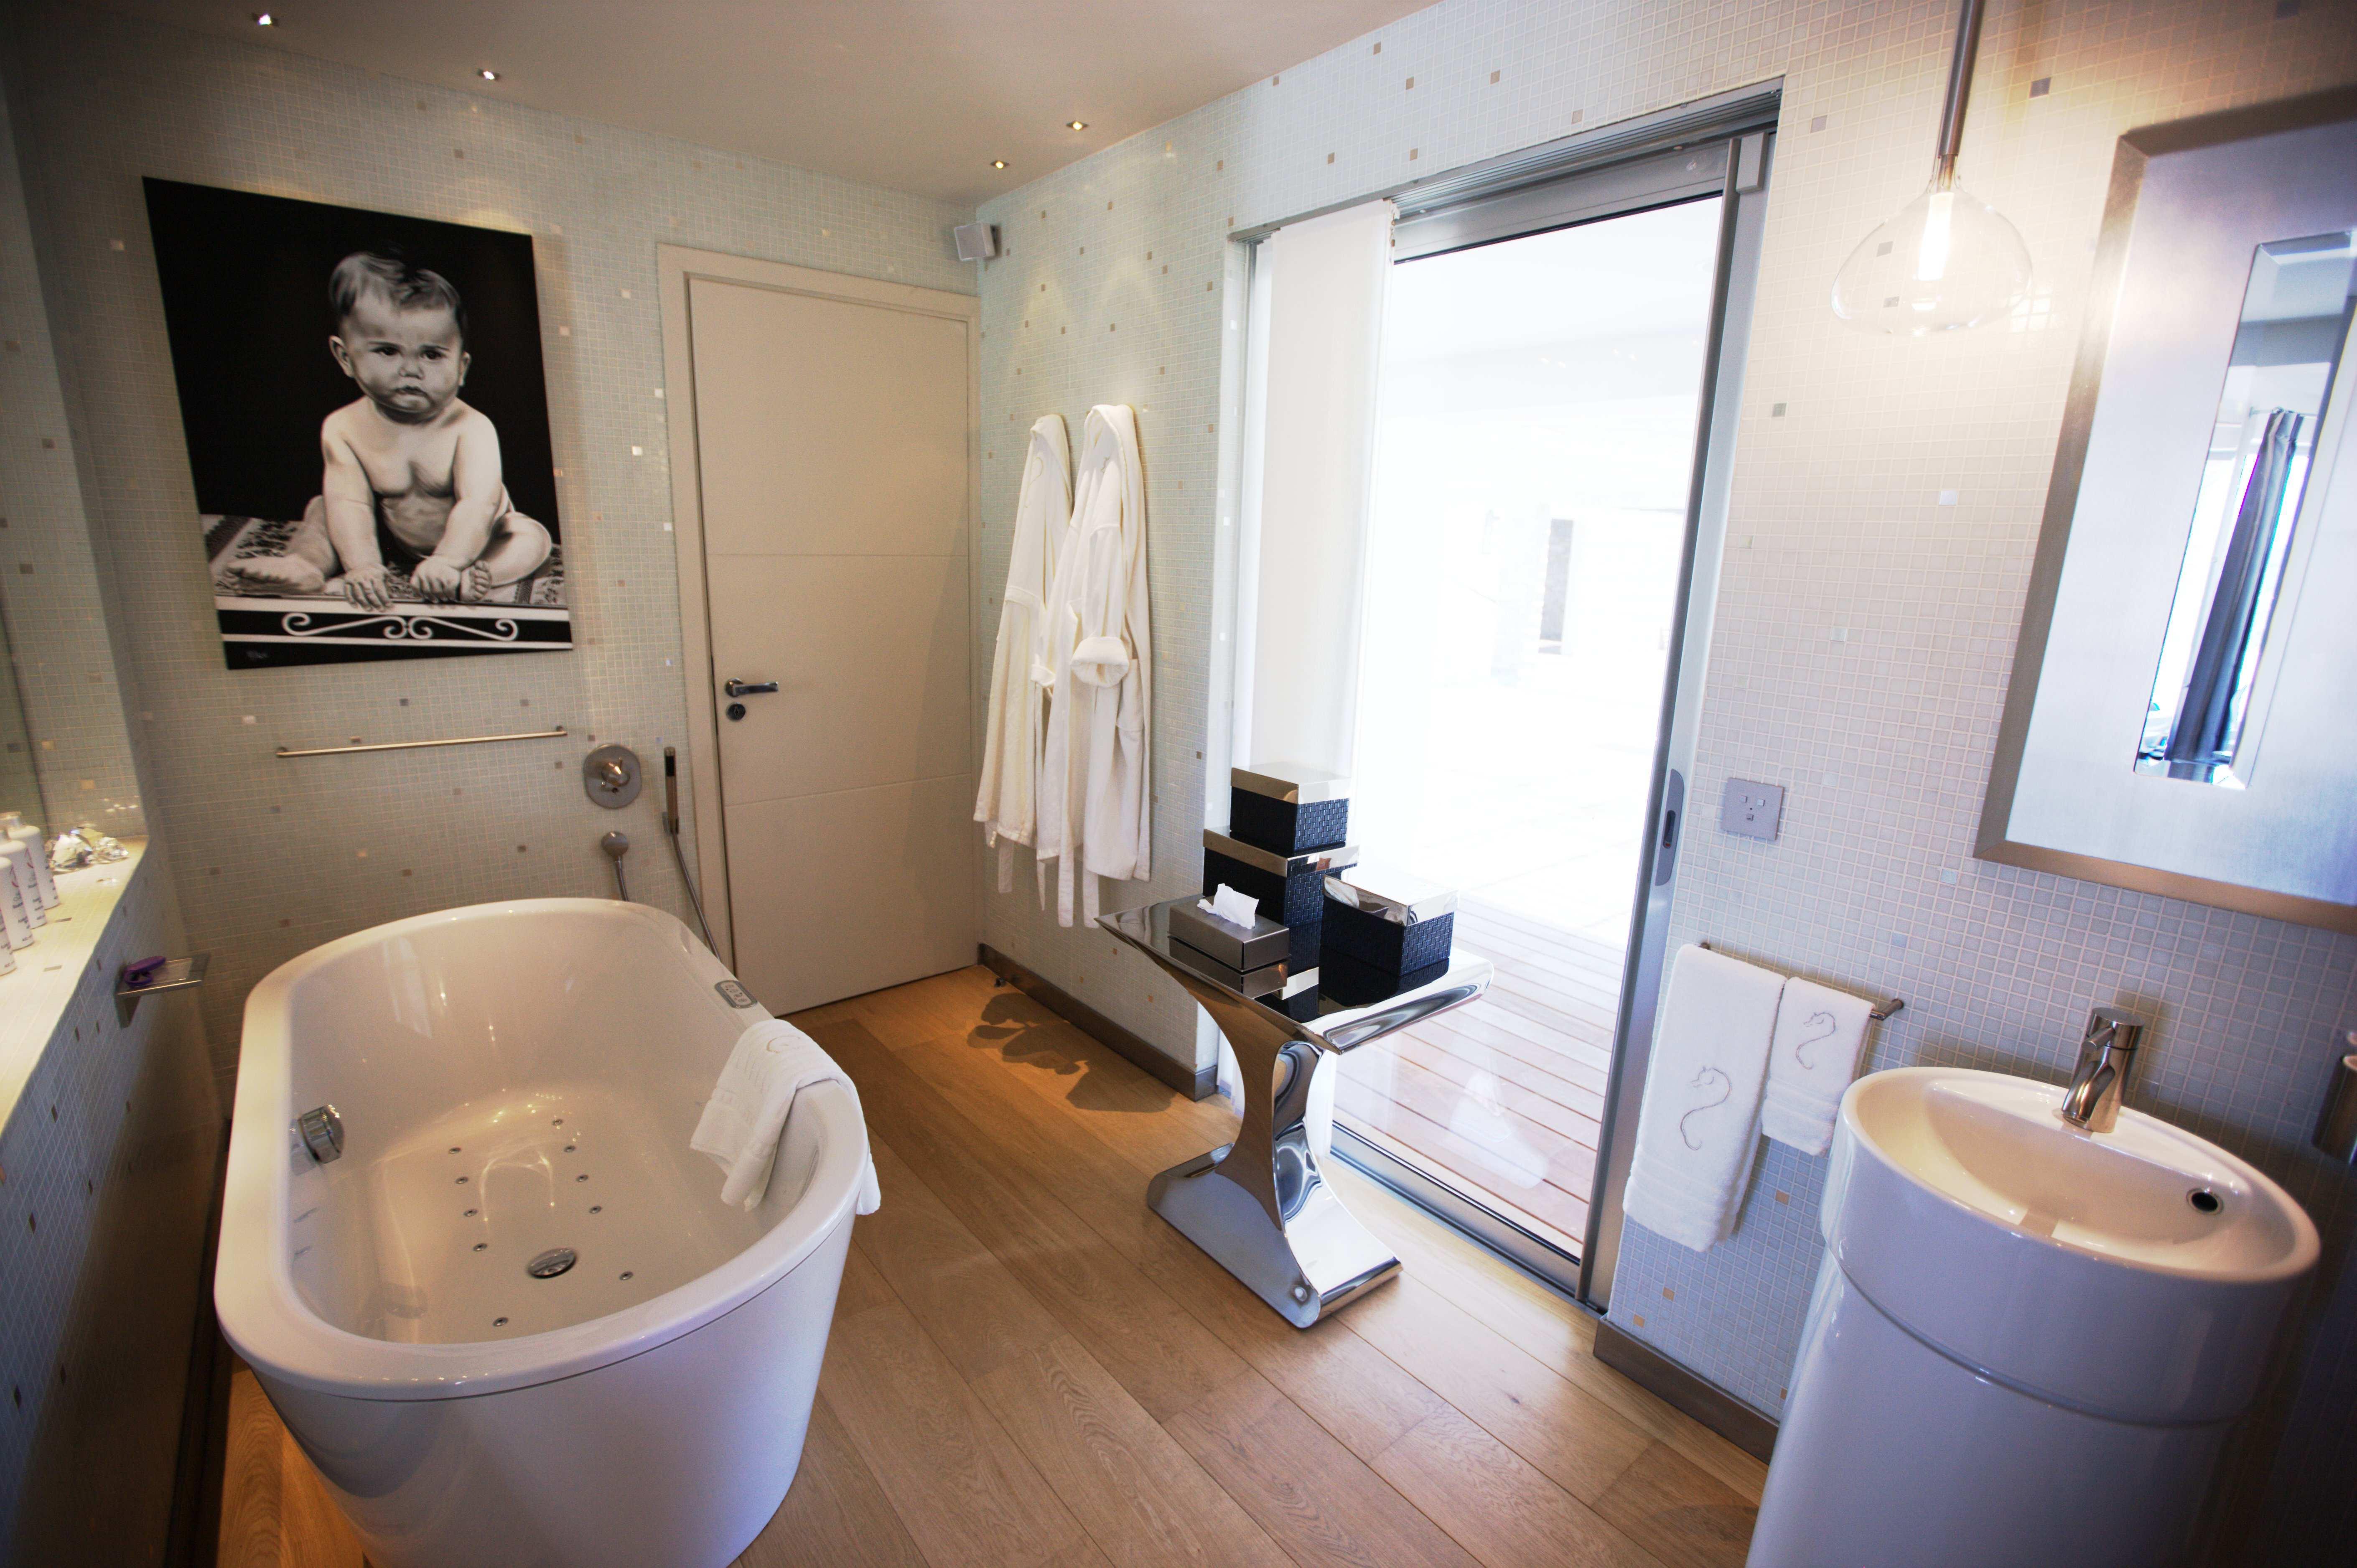 salle de bain installation domotique - Domotique Salle De Bain